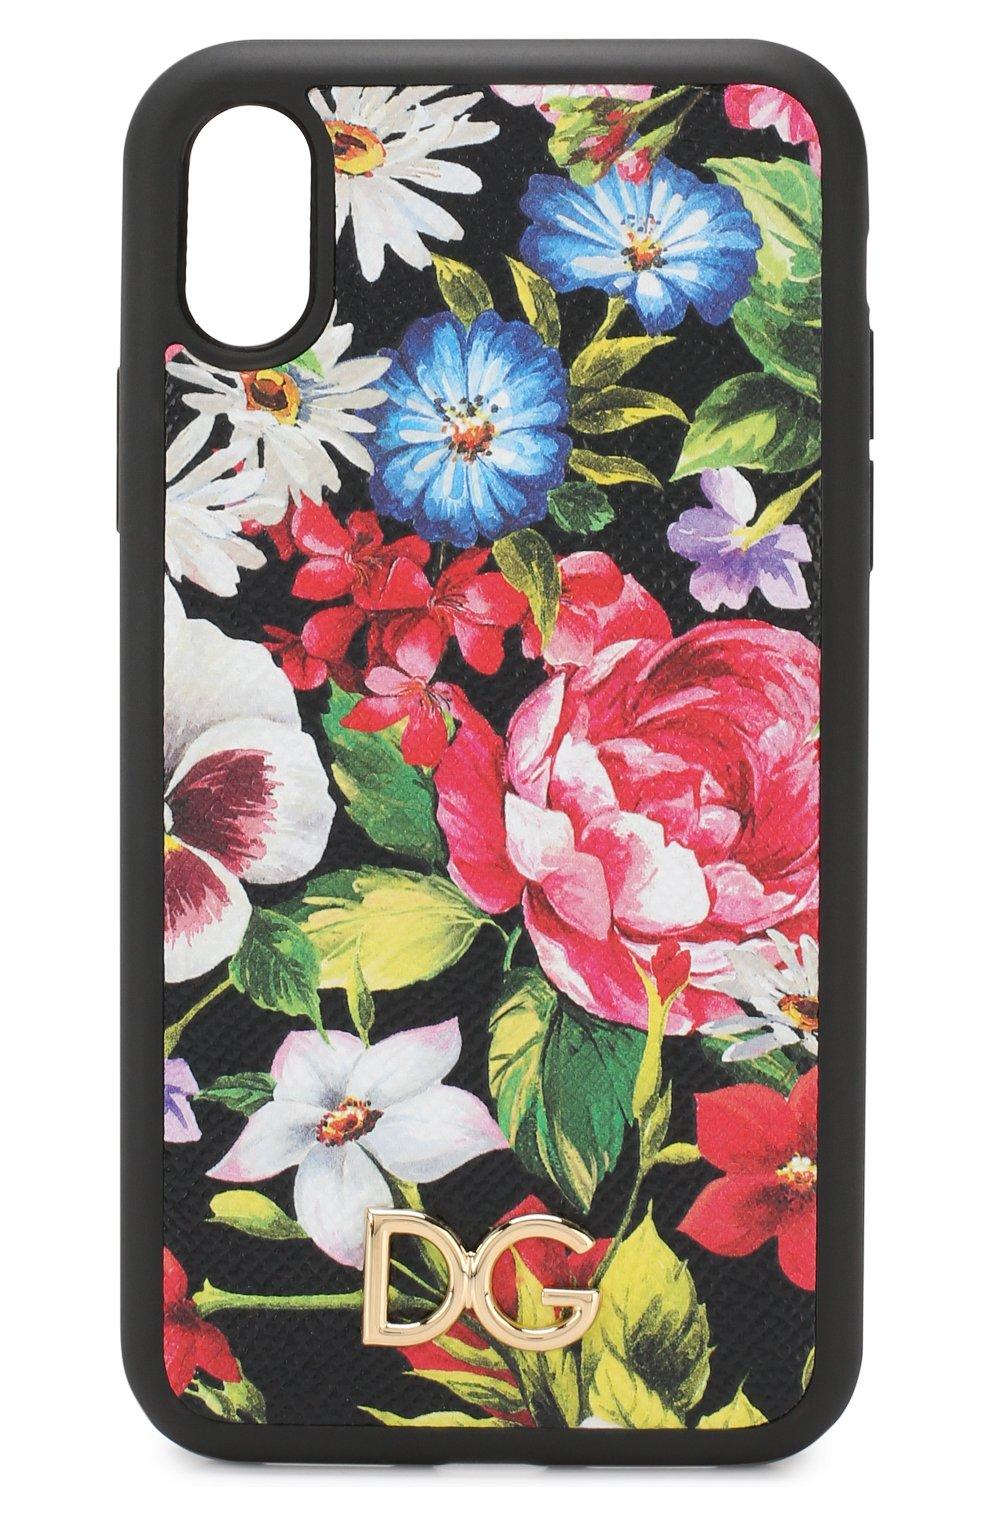 Мужской чехол для iphone xr DOLCE & GABBANA разноцветного цвета, арт. BI2516/AK878 | Фото 1